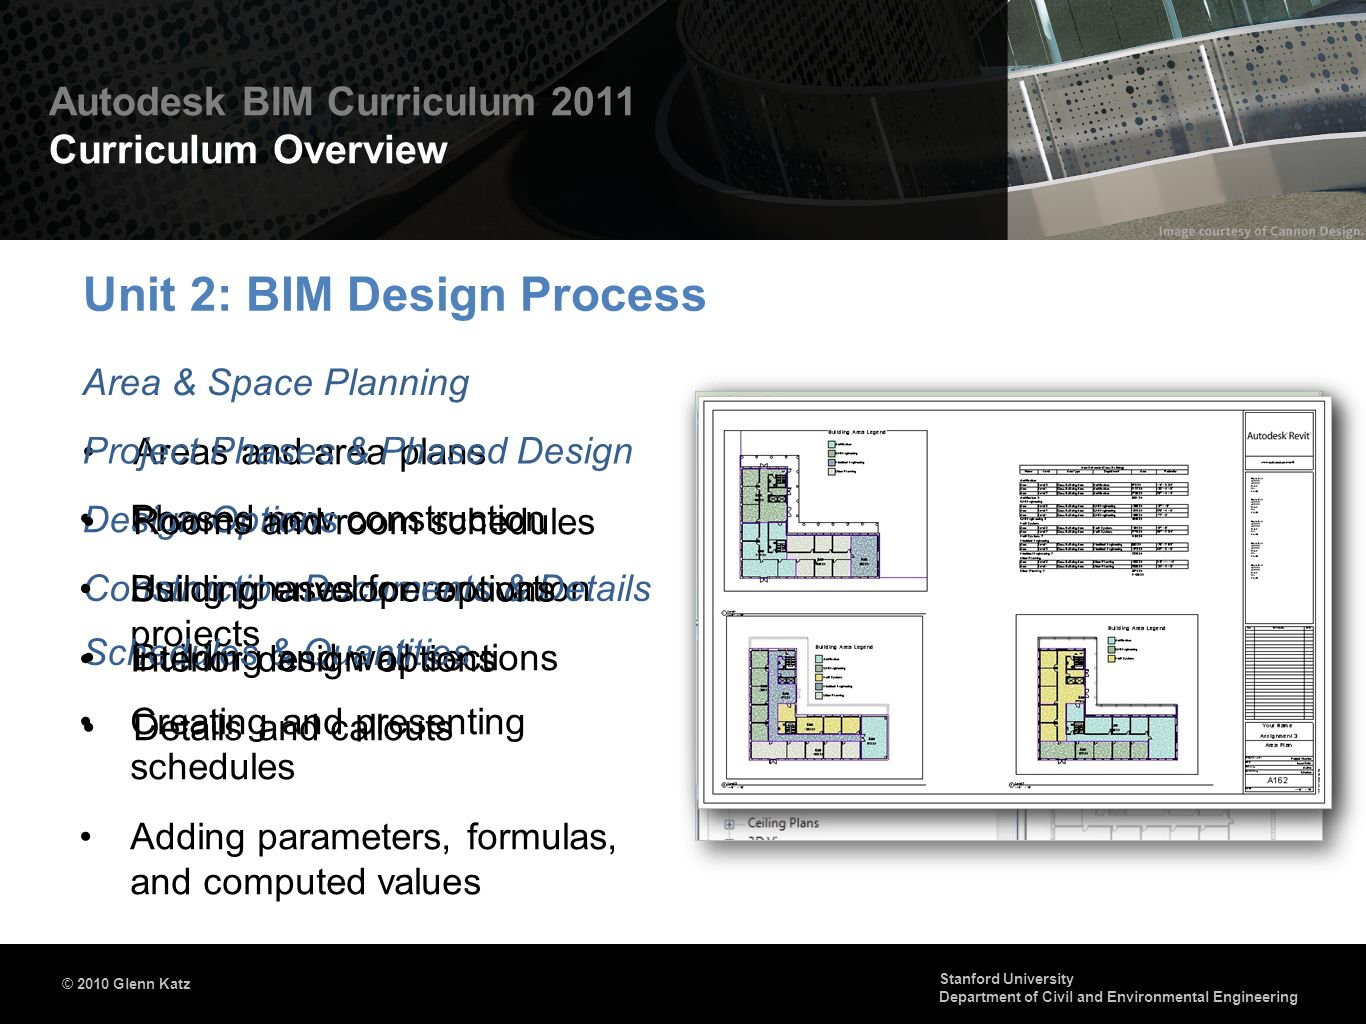 Unit 2: BIM Design Process